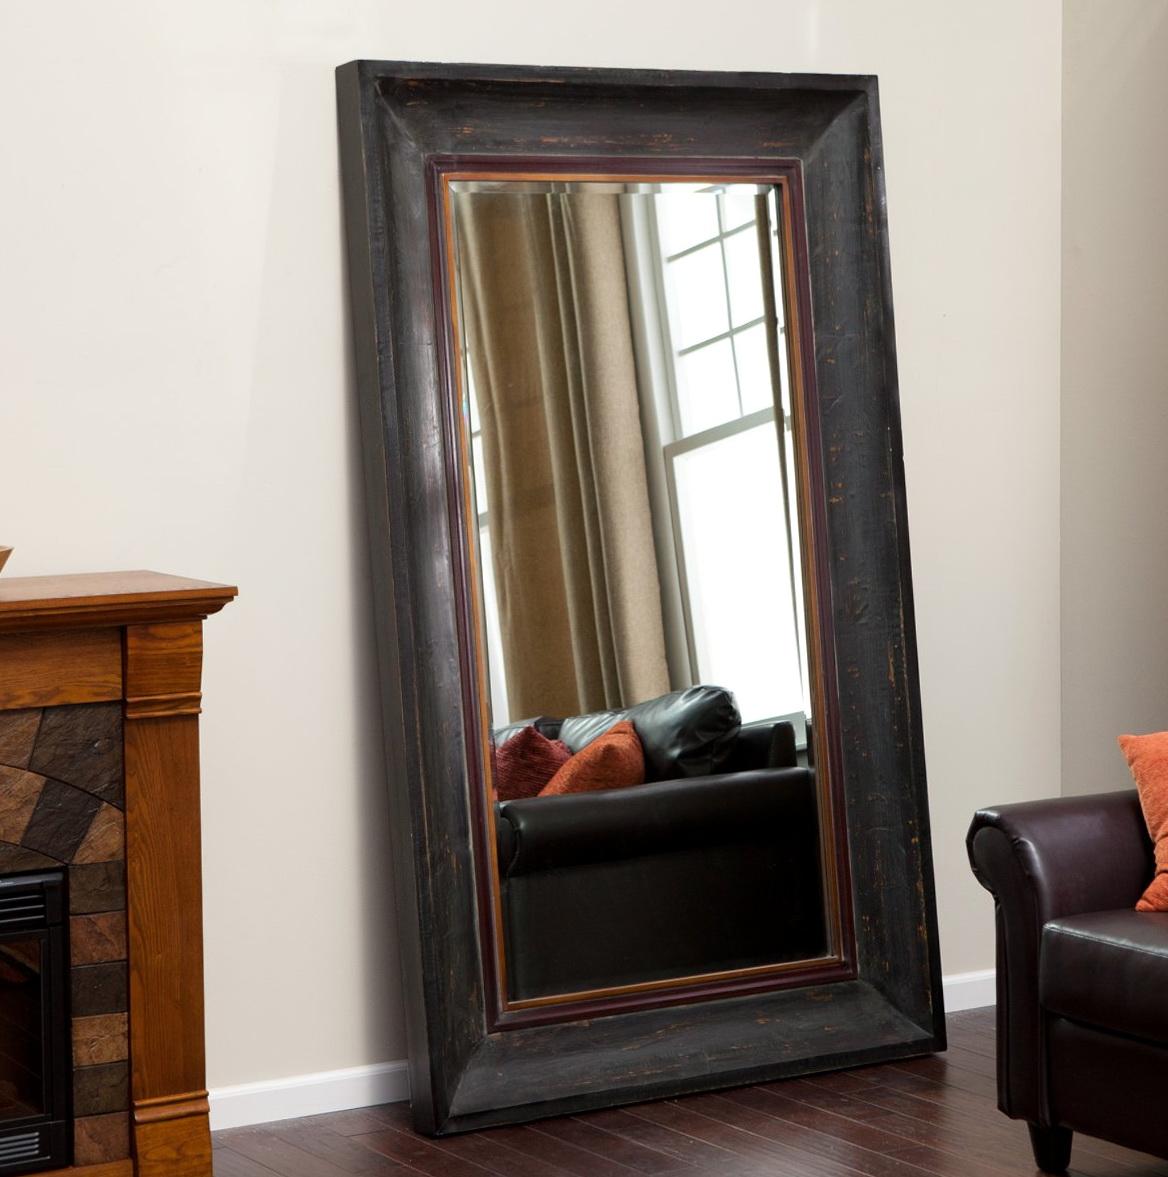 Diy Leaning Floor Mirror | Home Design Ideas